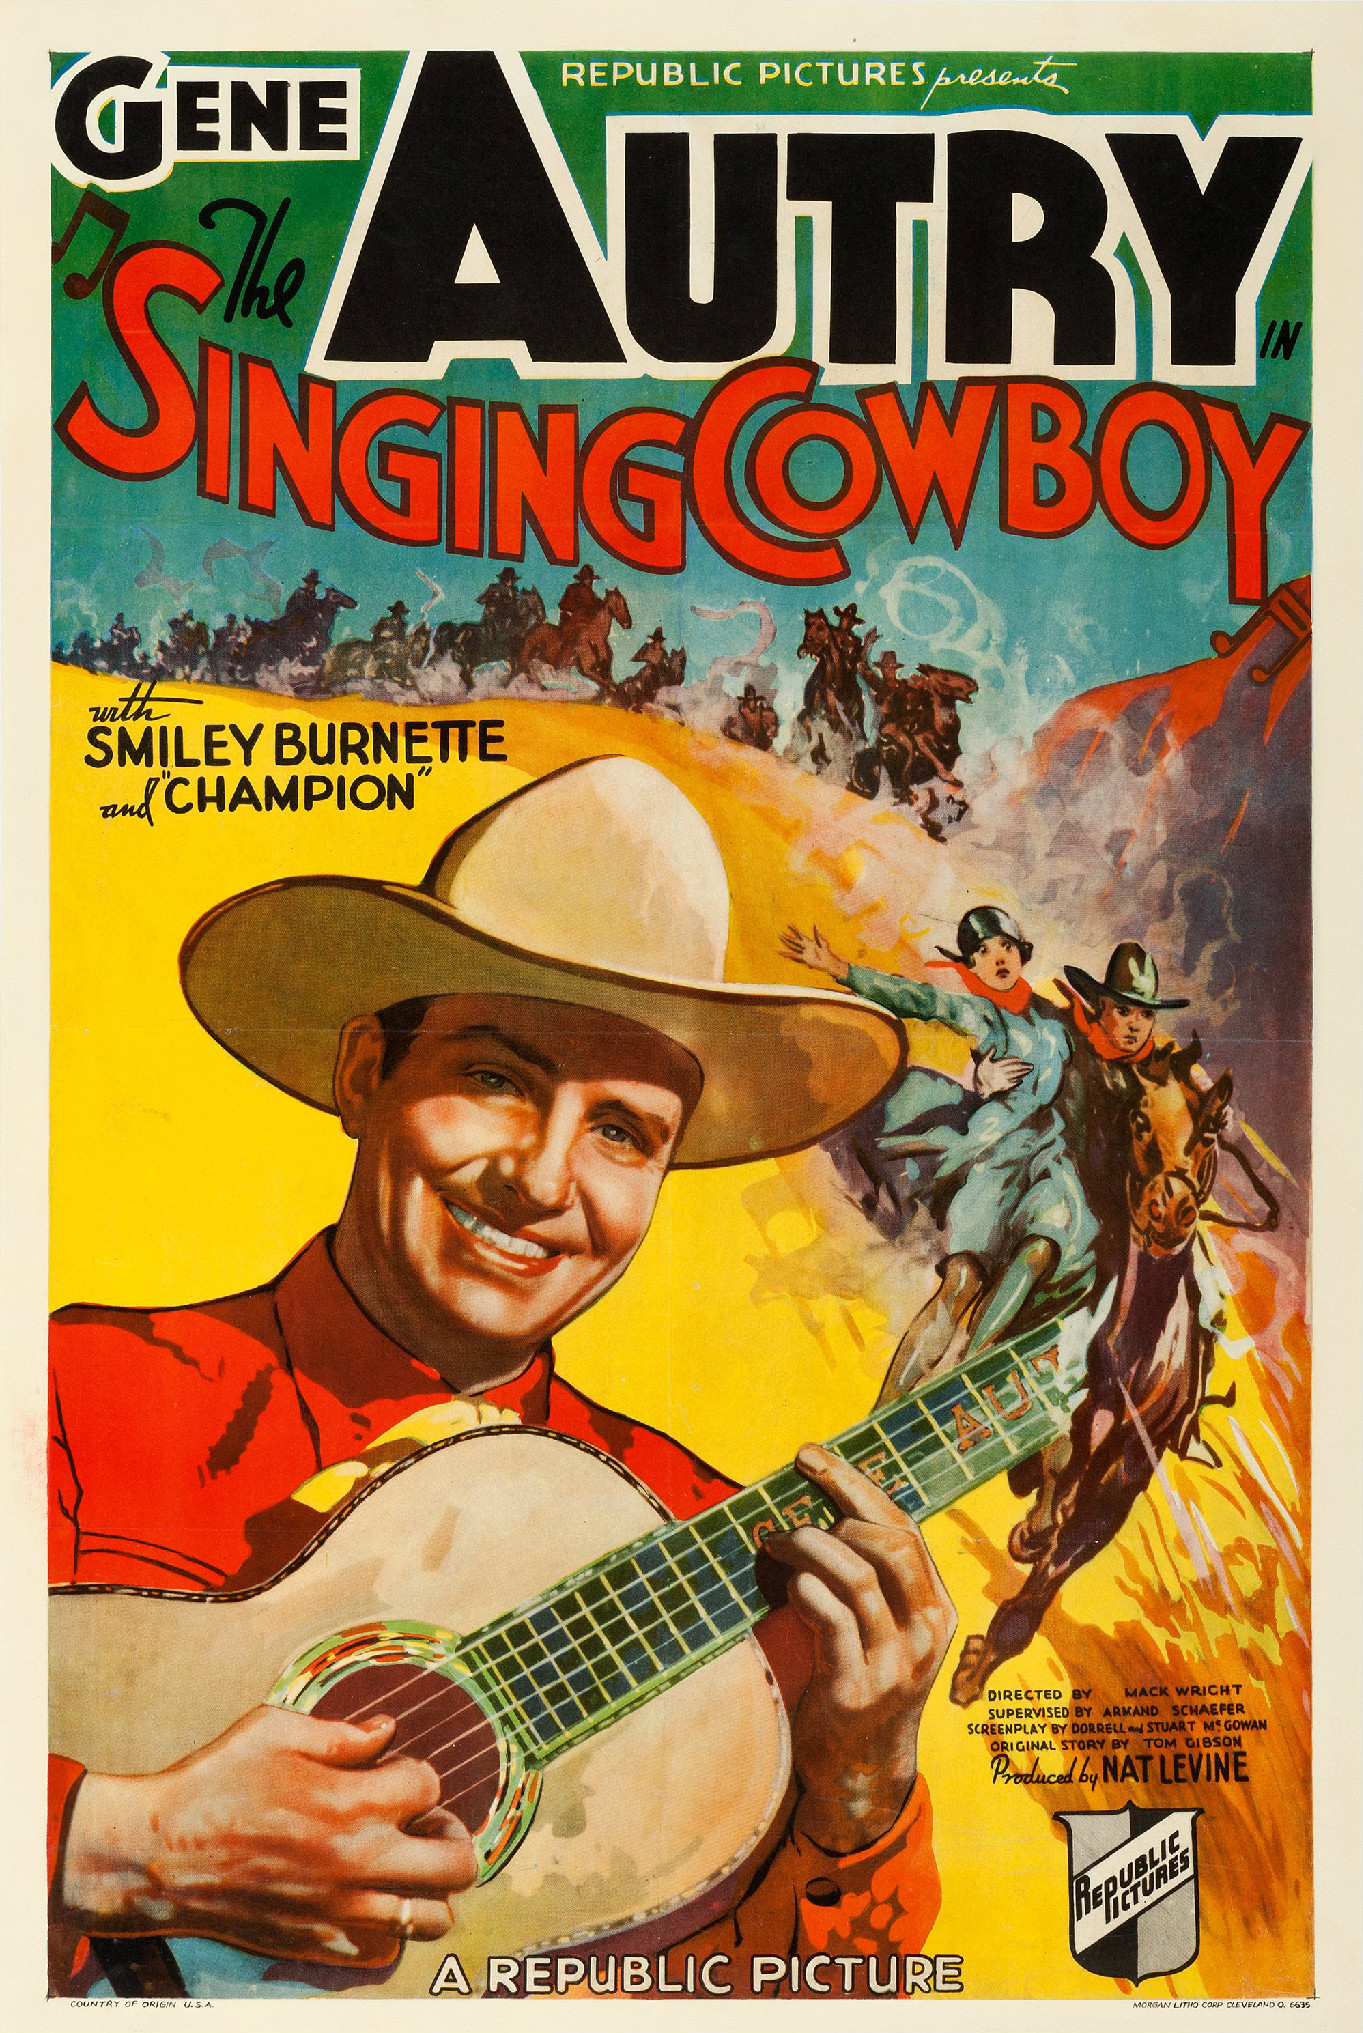 The_Singing_Cowboy_1936_Poster.jpg